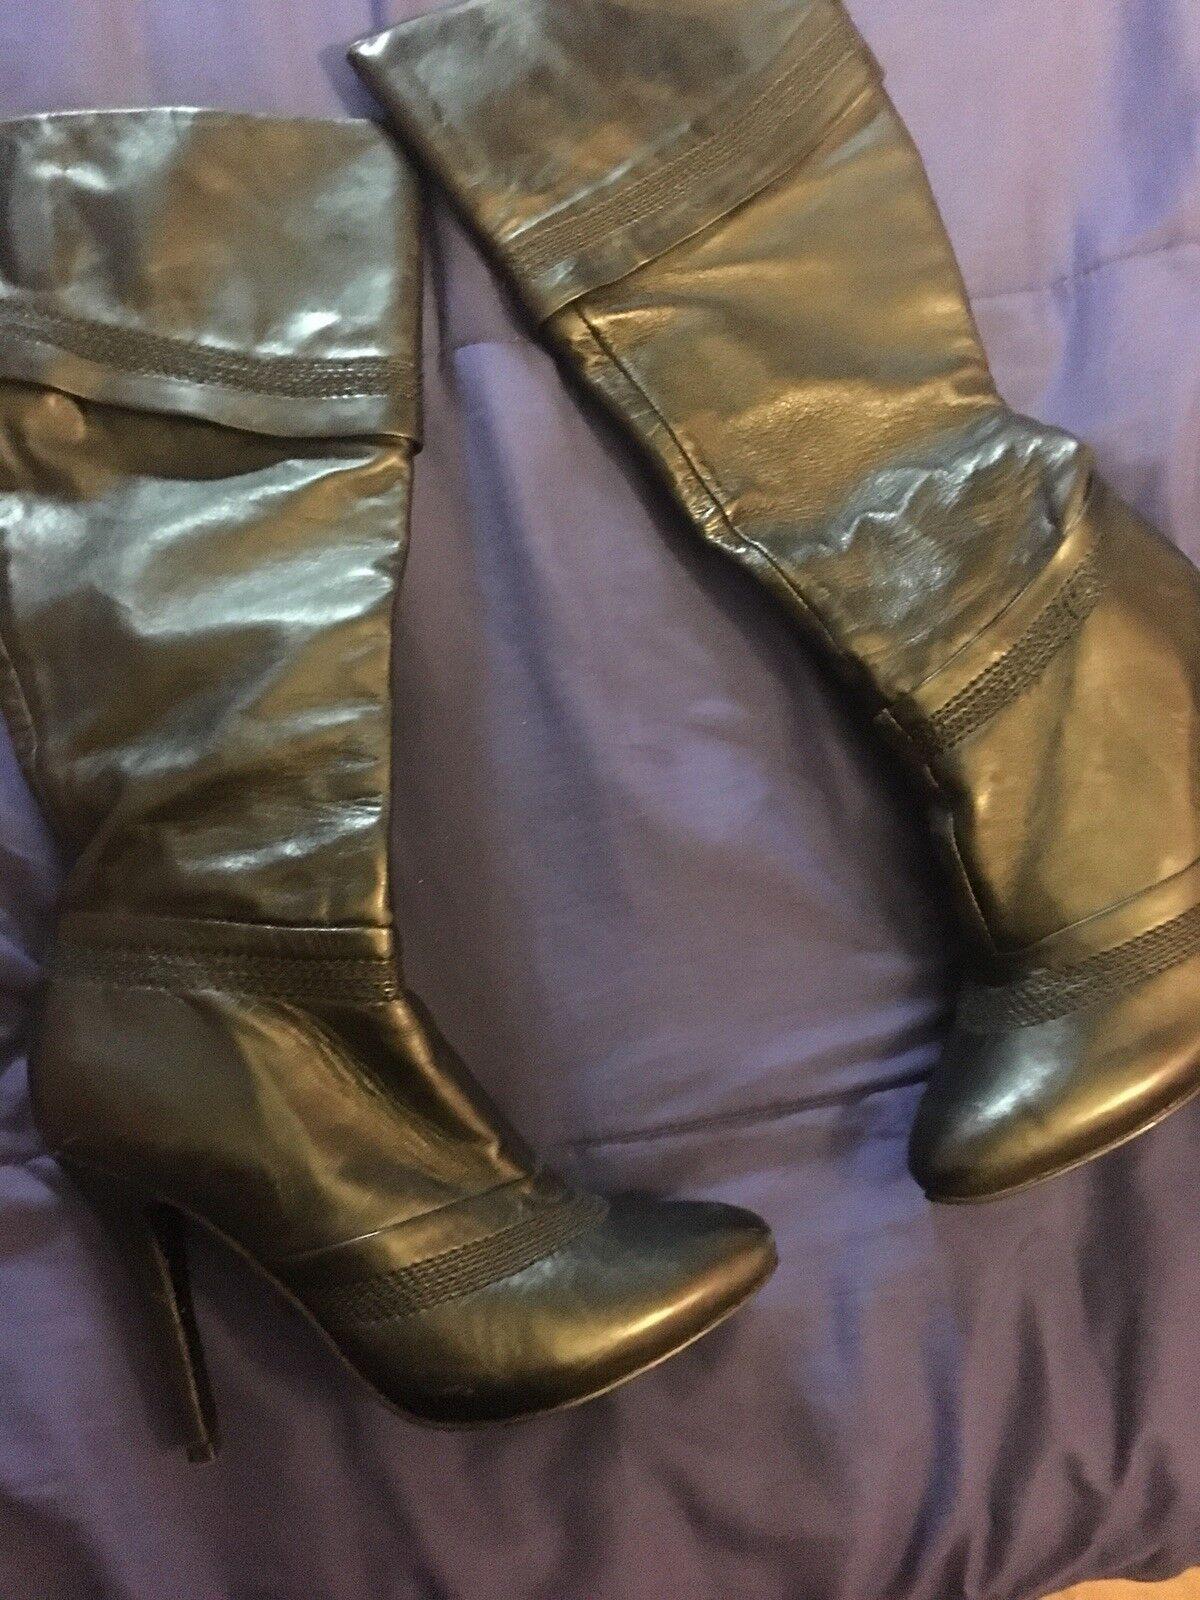 Aldo Black Leather Knee High Stiletto Boots Size 38